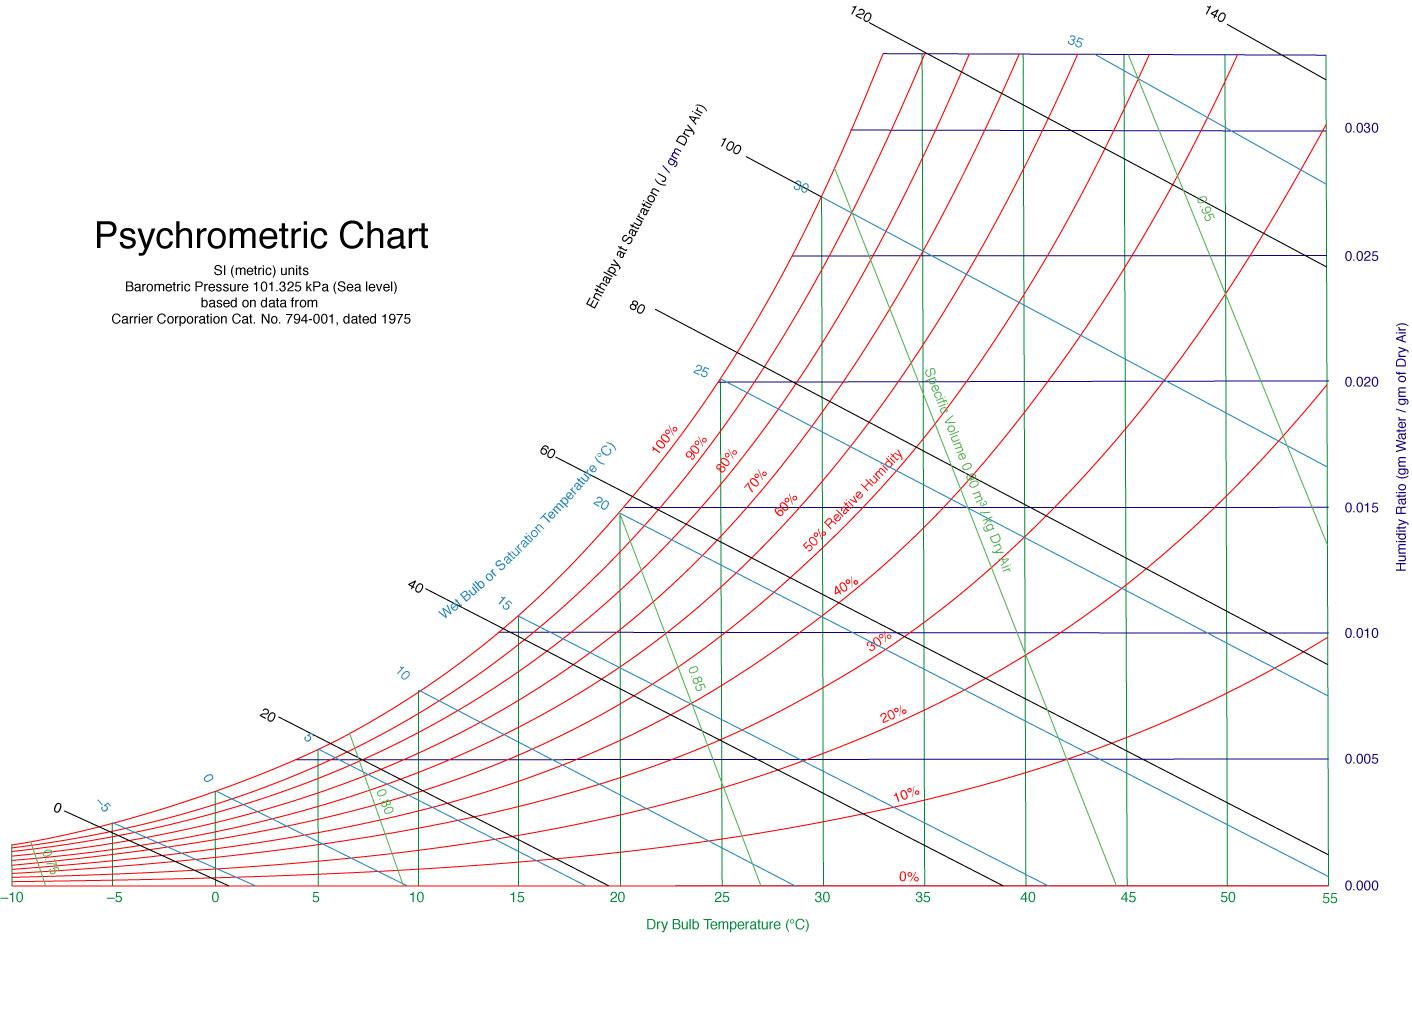 Psychrometric-Chart.jpg